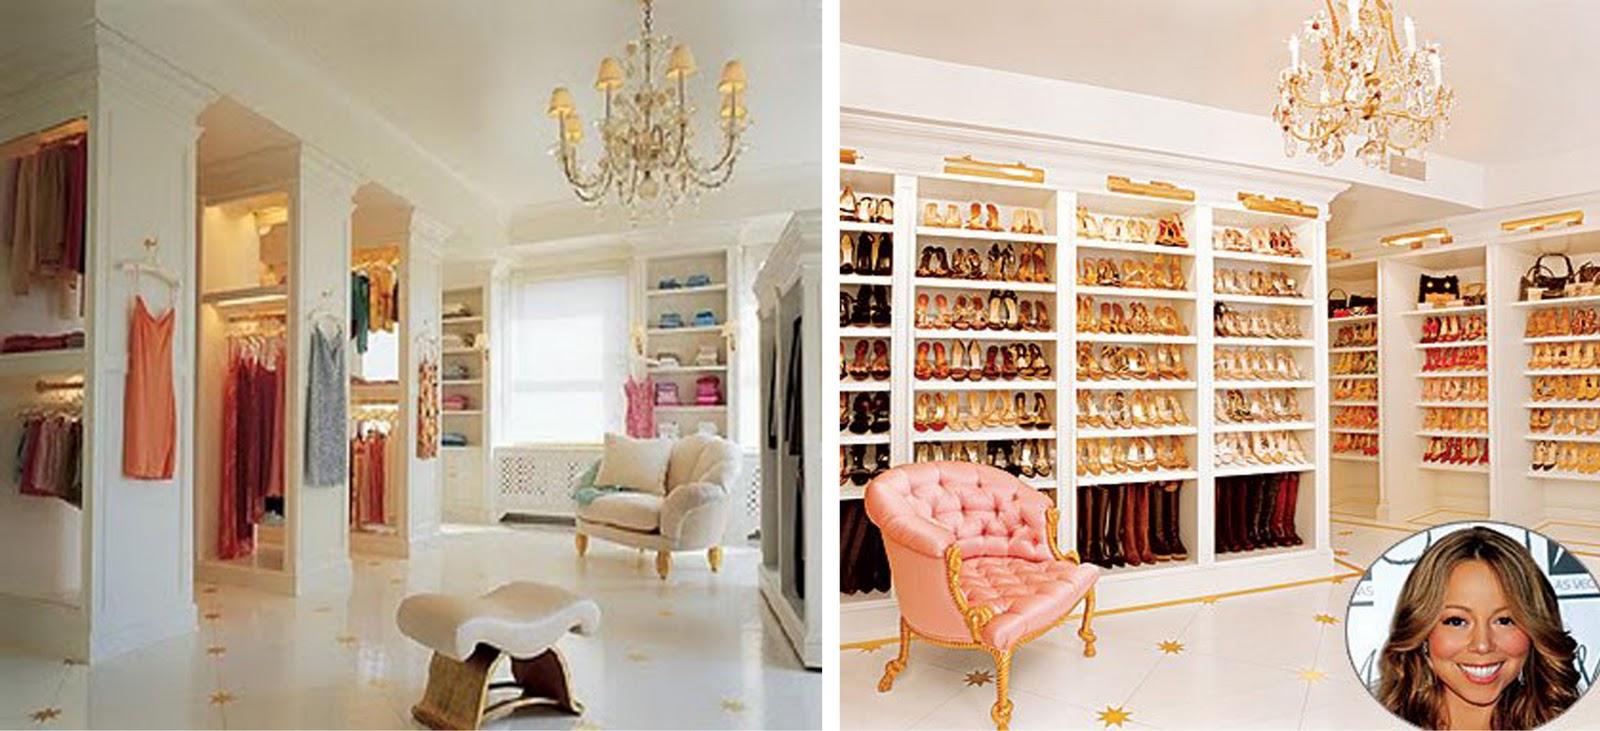 Outstanding Inside Mariah Careys Closet Top Walk In I To Na Zvjezdani Nacin 1600 X 731